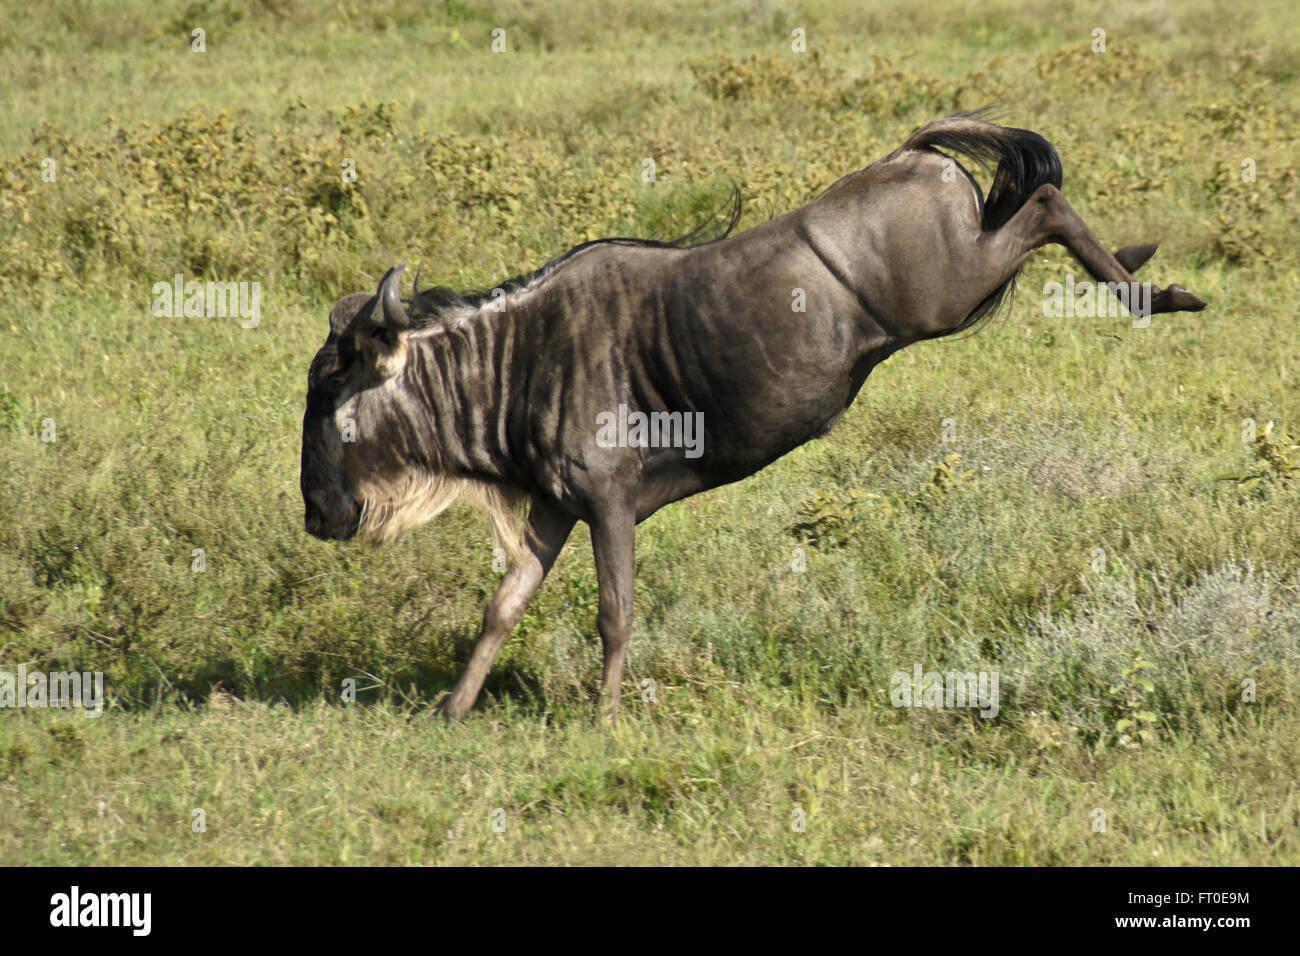 Wildebeest kicking up its heels, Ngorongoro Conservation Area (Ndutu), Tanzania - Stock Image